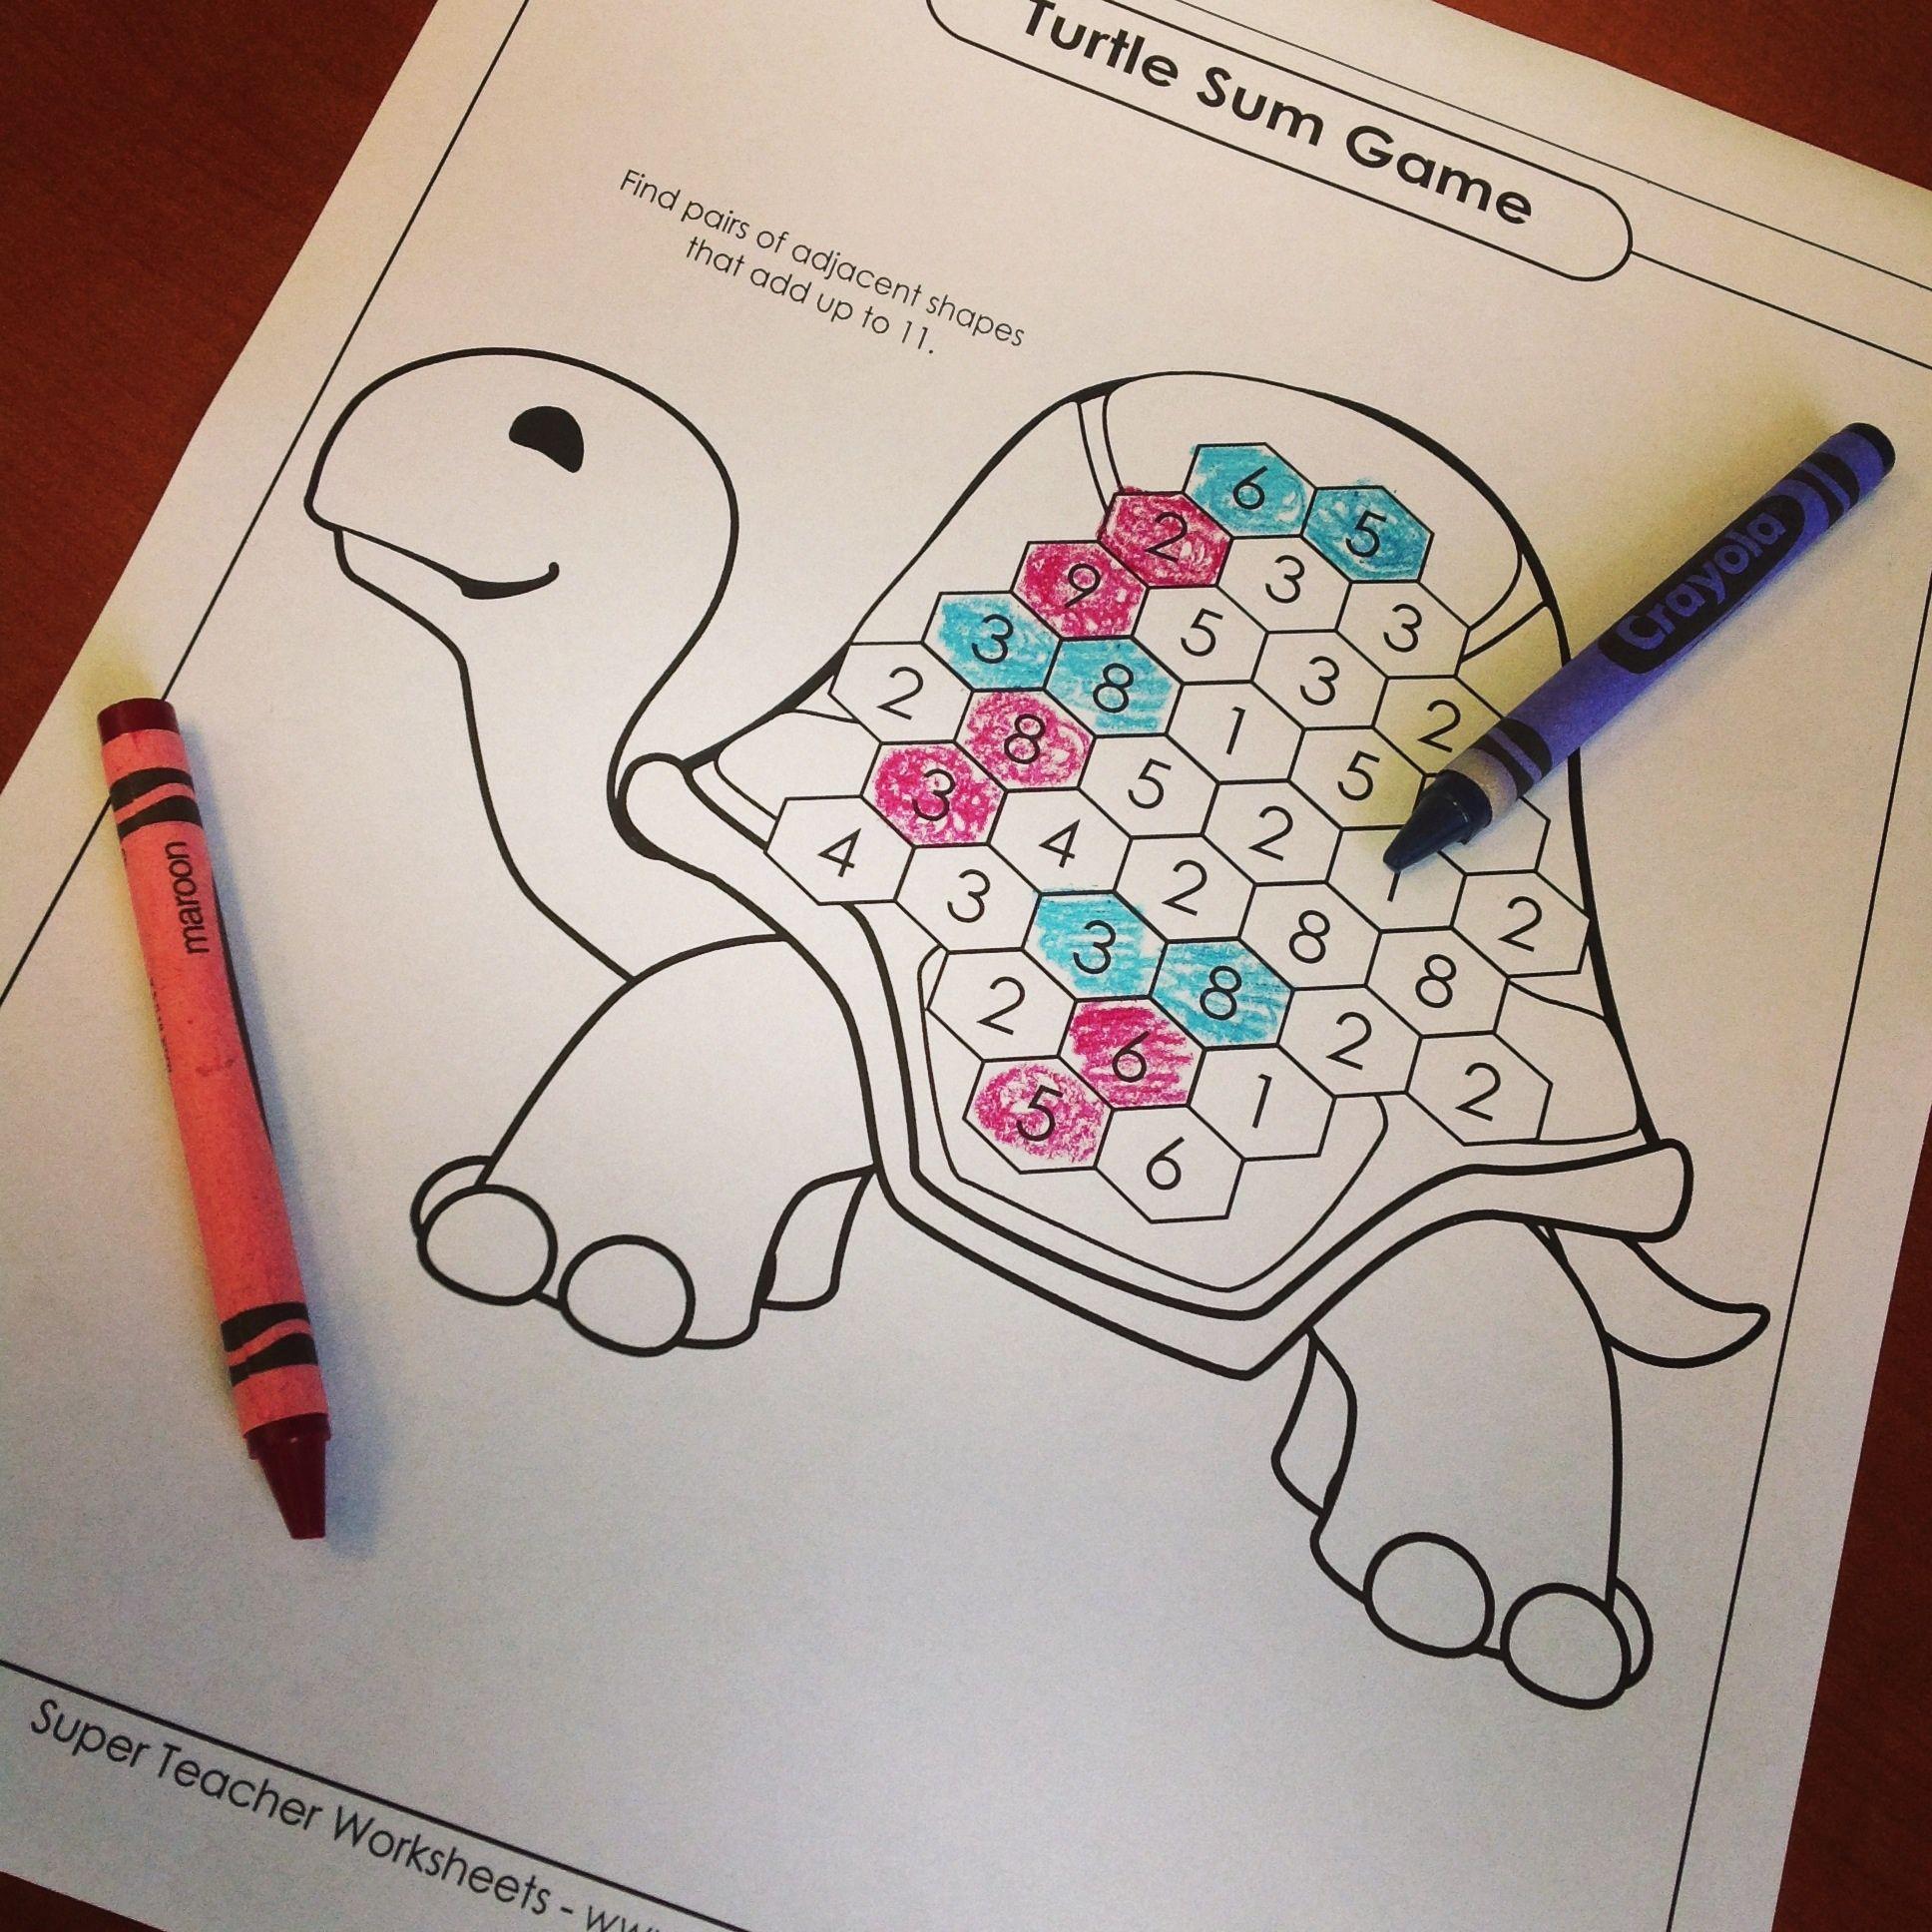 check out our new addition sum games math super teacher worksheets preschool worksheets. Black Bedroom Furniture Sets. Home Design Ideas